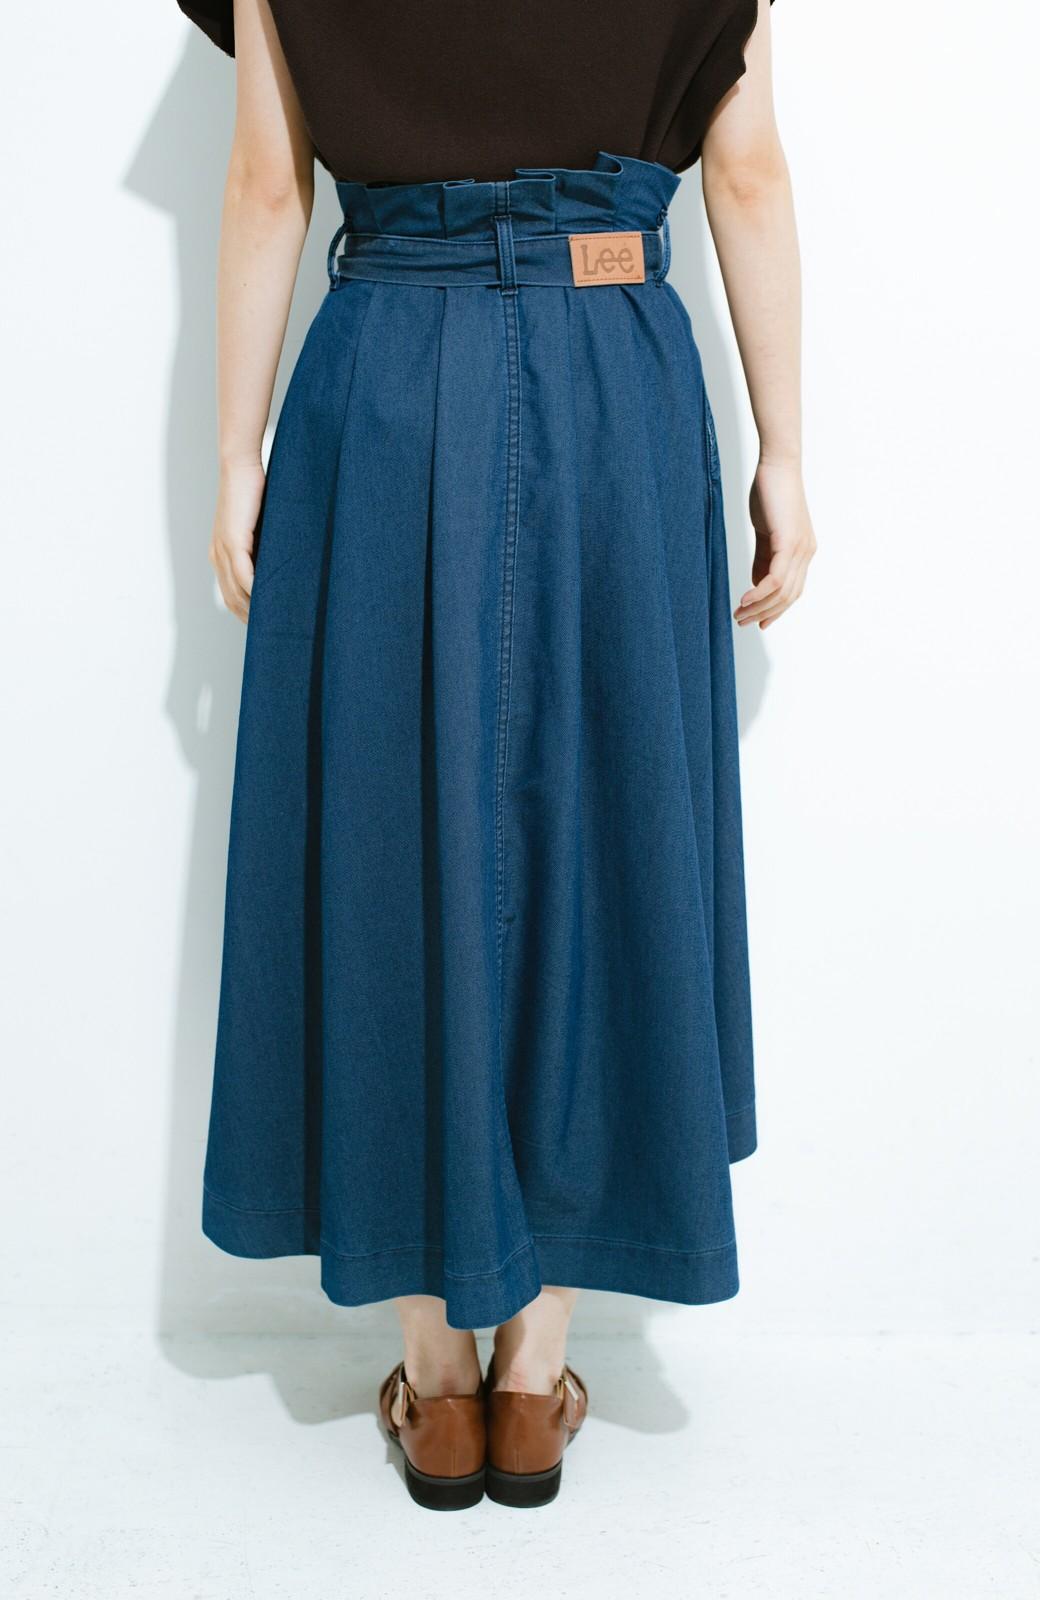 haco! Lady Lee ウエストリボンのペーパーバッグスカート <ブルー>の商品写真6